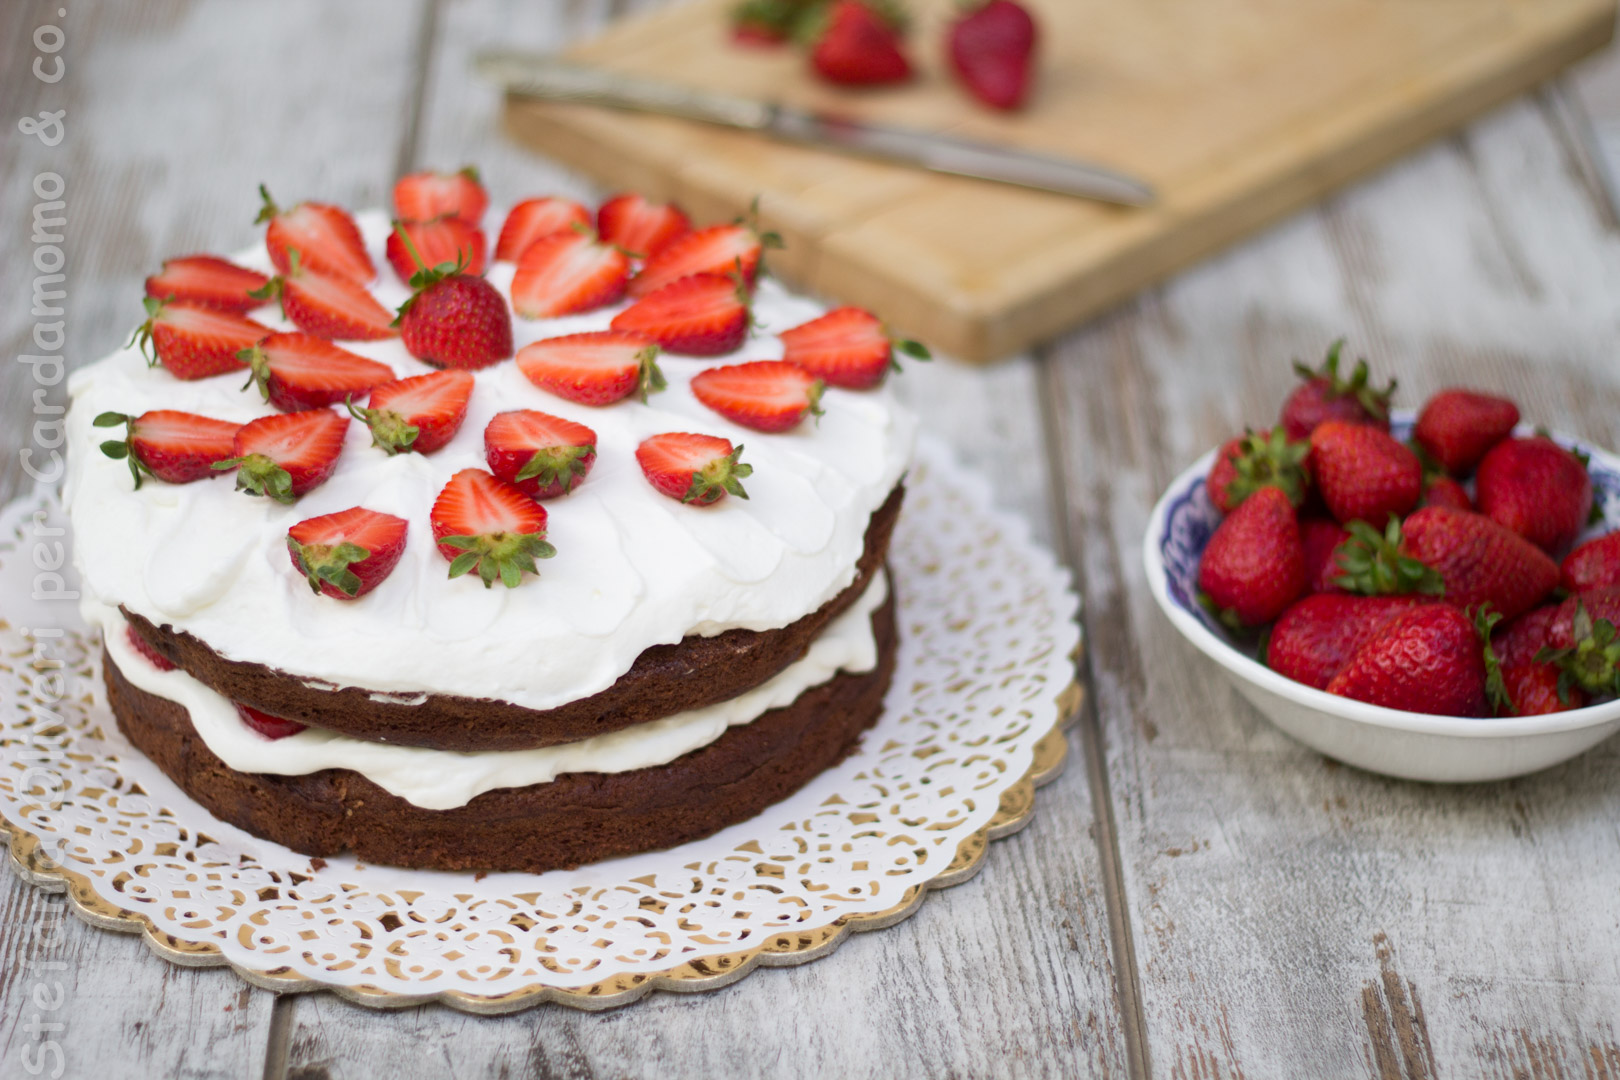 Torta cioccolato crema yogurt e fragole cardamomo & co 2923